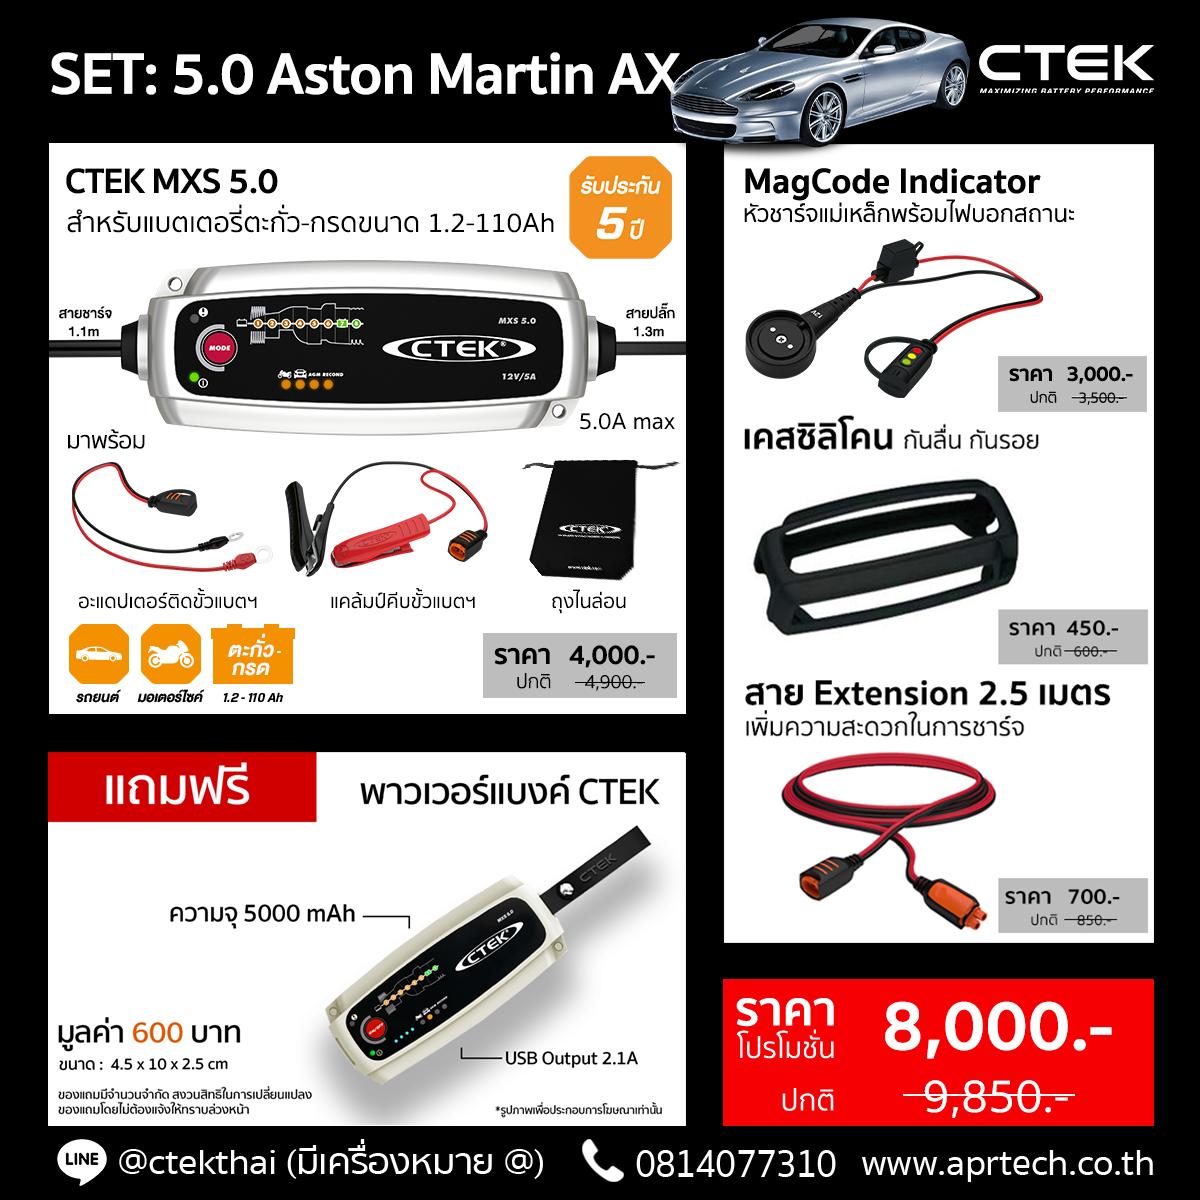 SET 5.0 Aston Martin AX (MXS 5.0 + MagCode Indicator + Bumper + Extension 2.5)